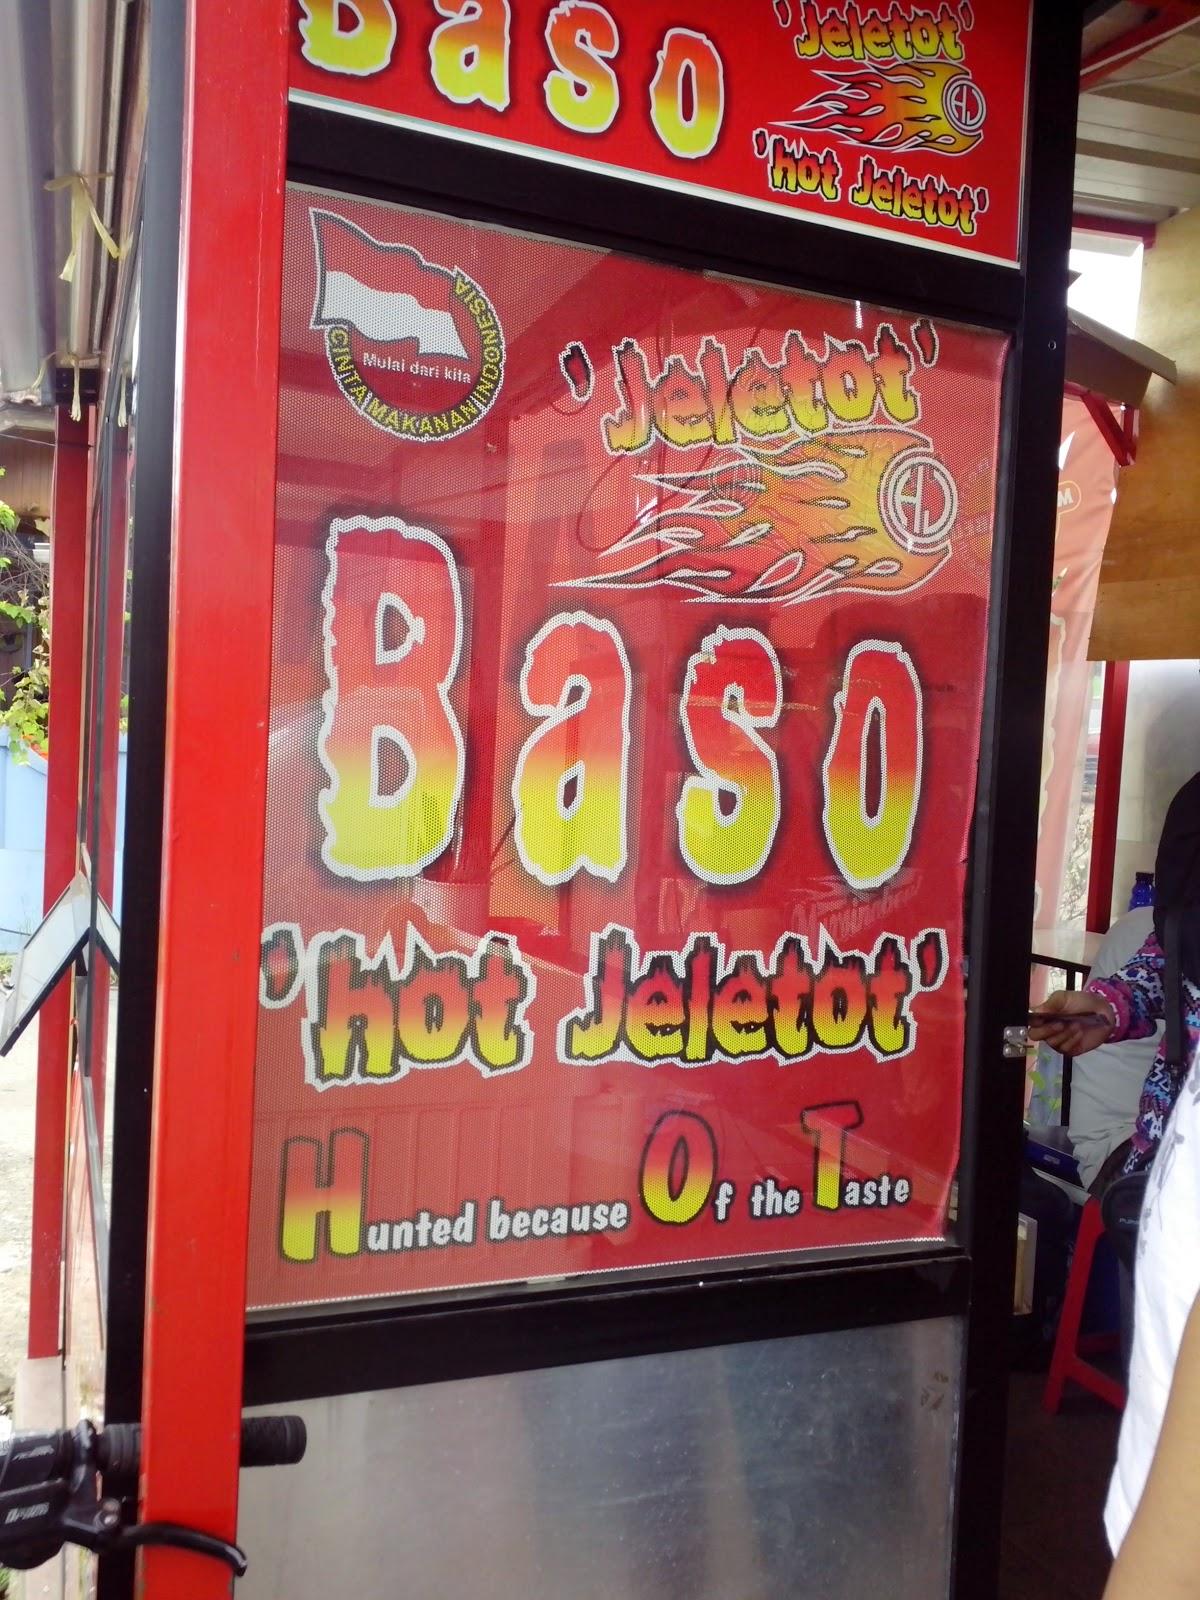 Baso Hot Jeletot Lagi Booming di Bandung